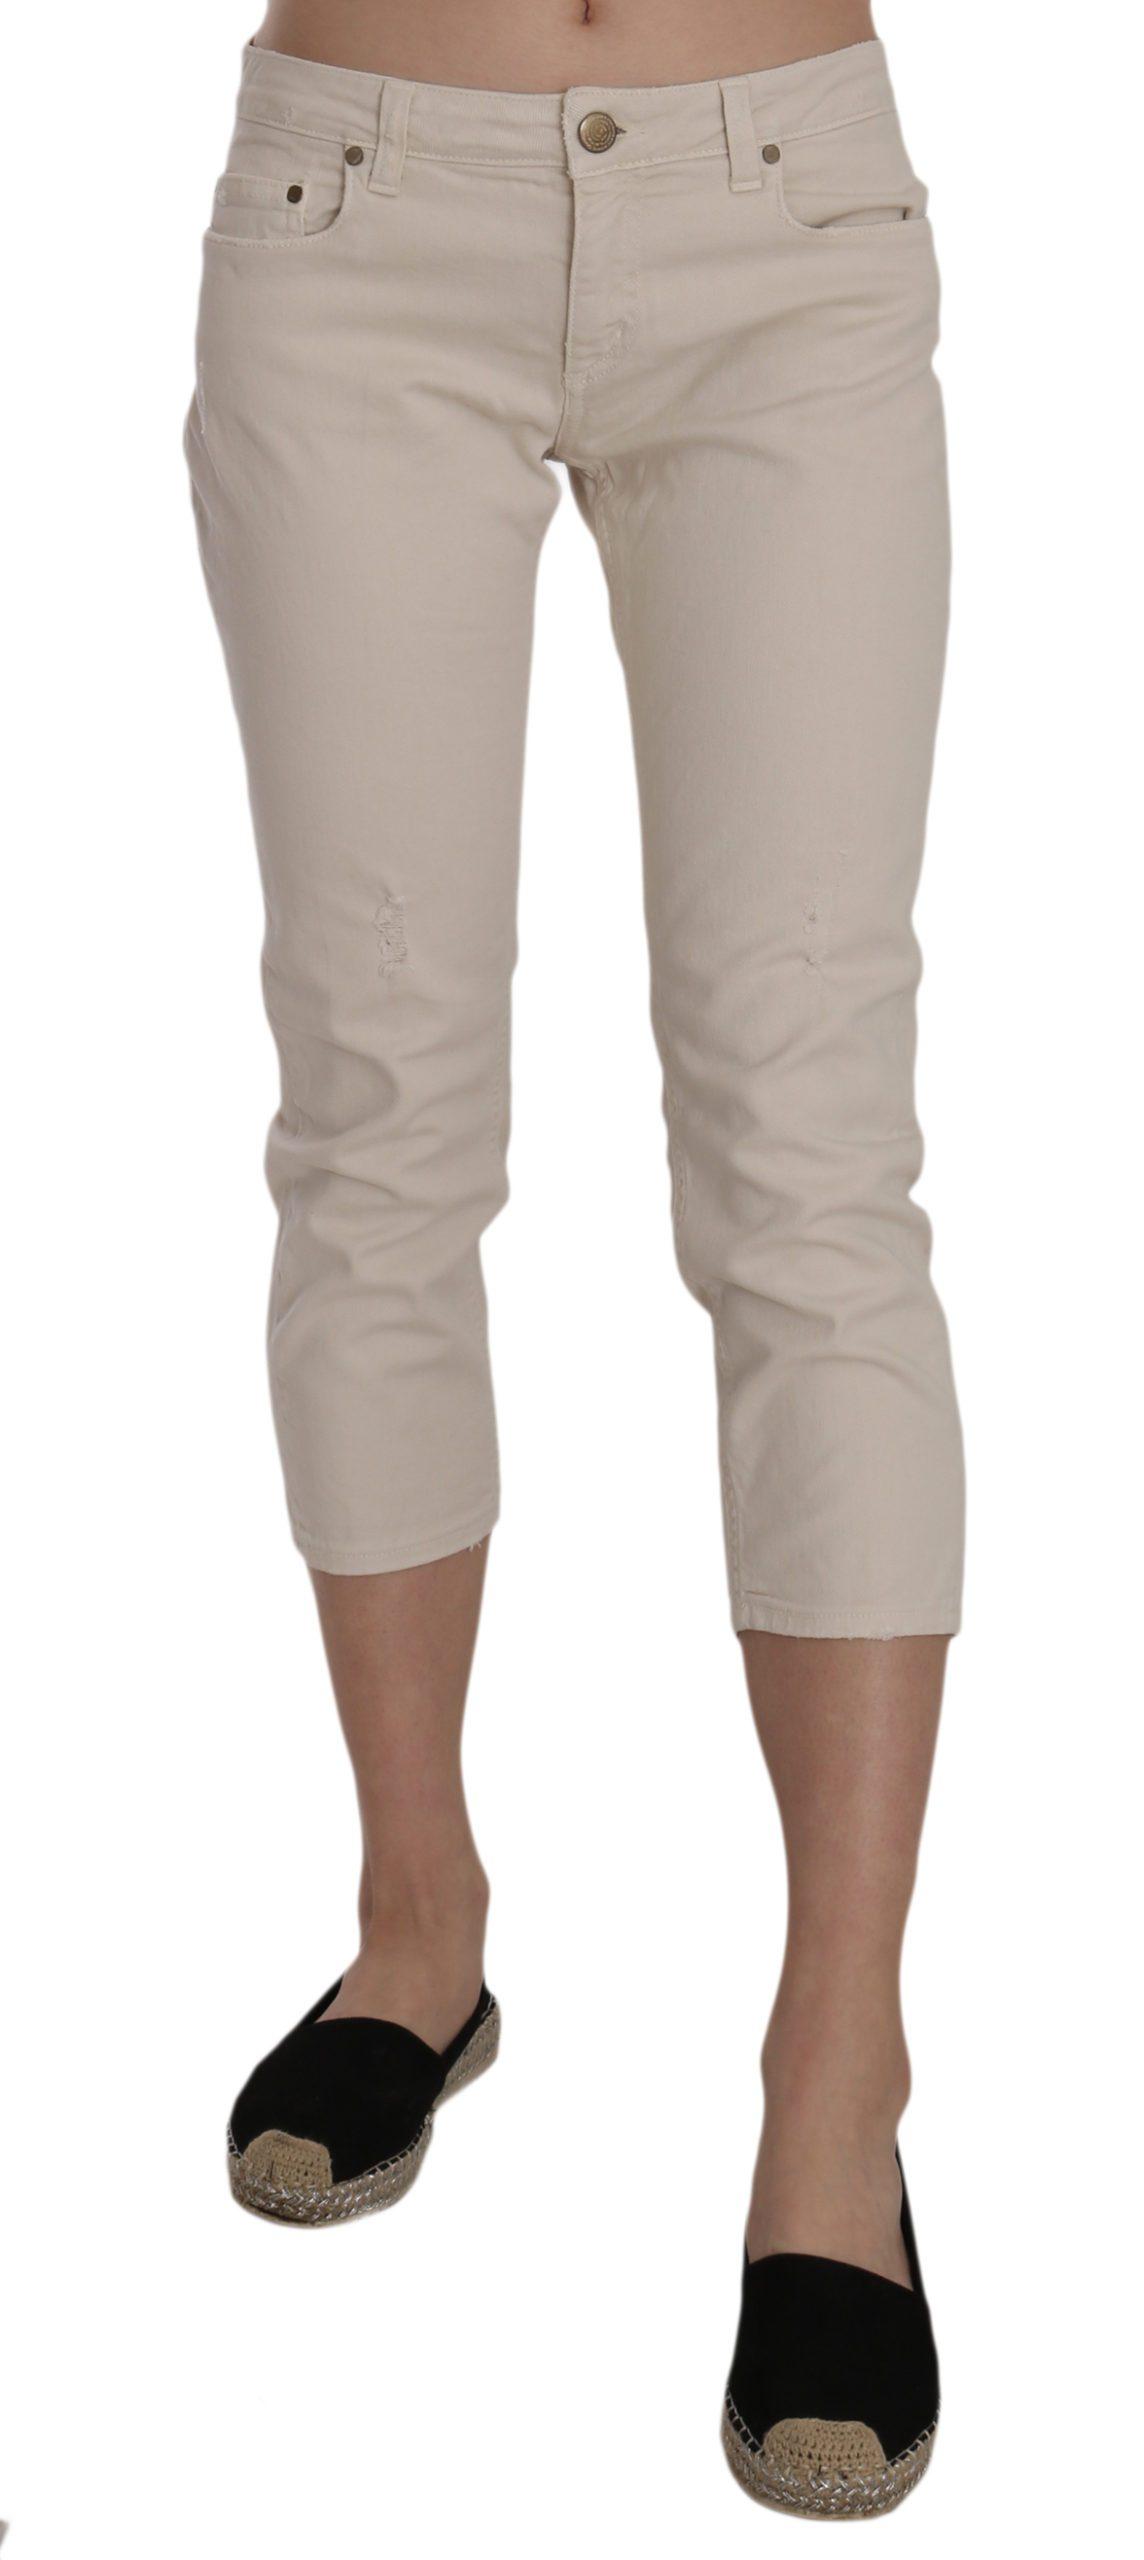 Dondup Women's Cotton Stretch Low Waist Skinny Trouser Beige PAN70211 - W29